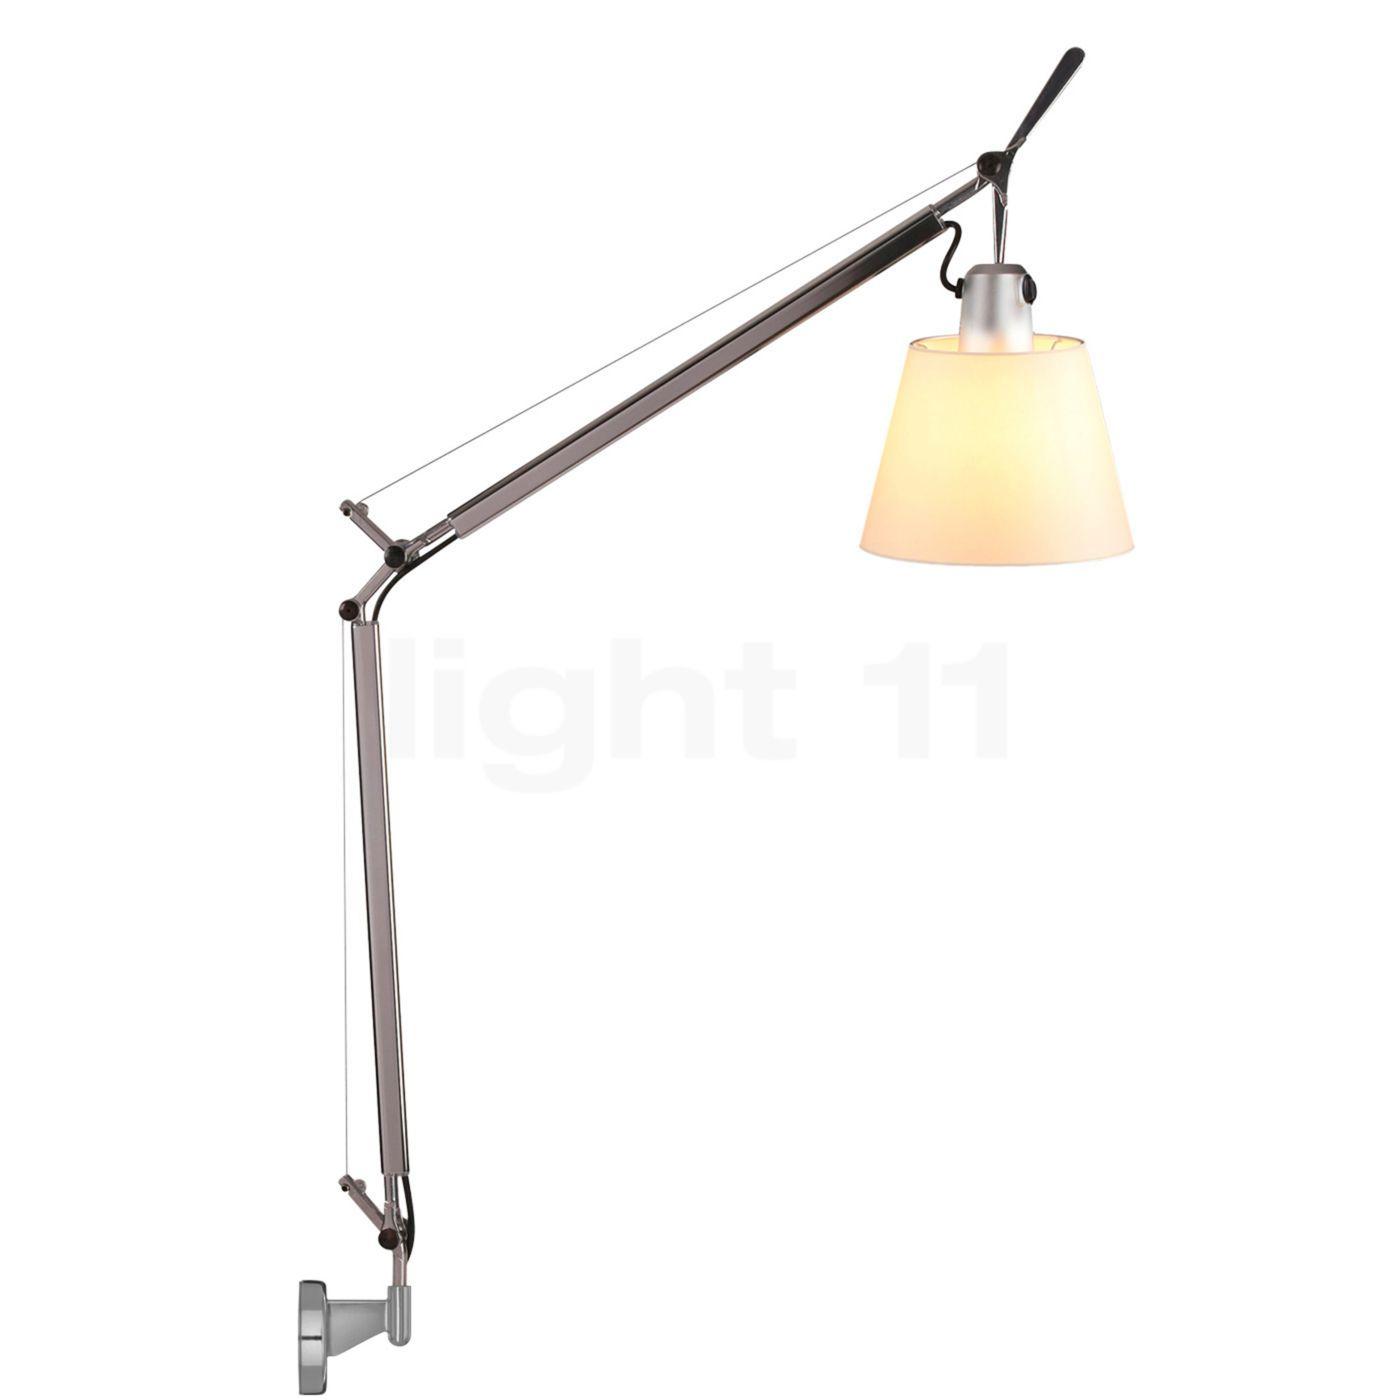 artemide tolomeo basculante parete lampada da lettura. Black Bedroom Furniture Sets. Home Design Ideas